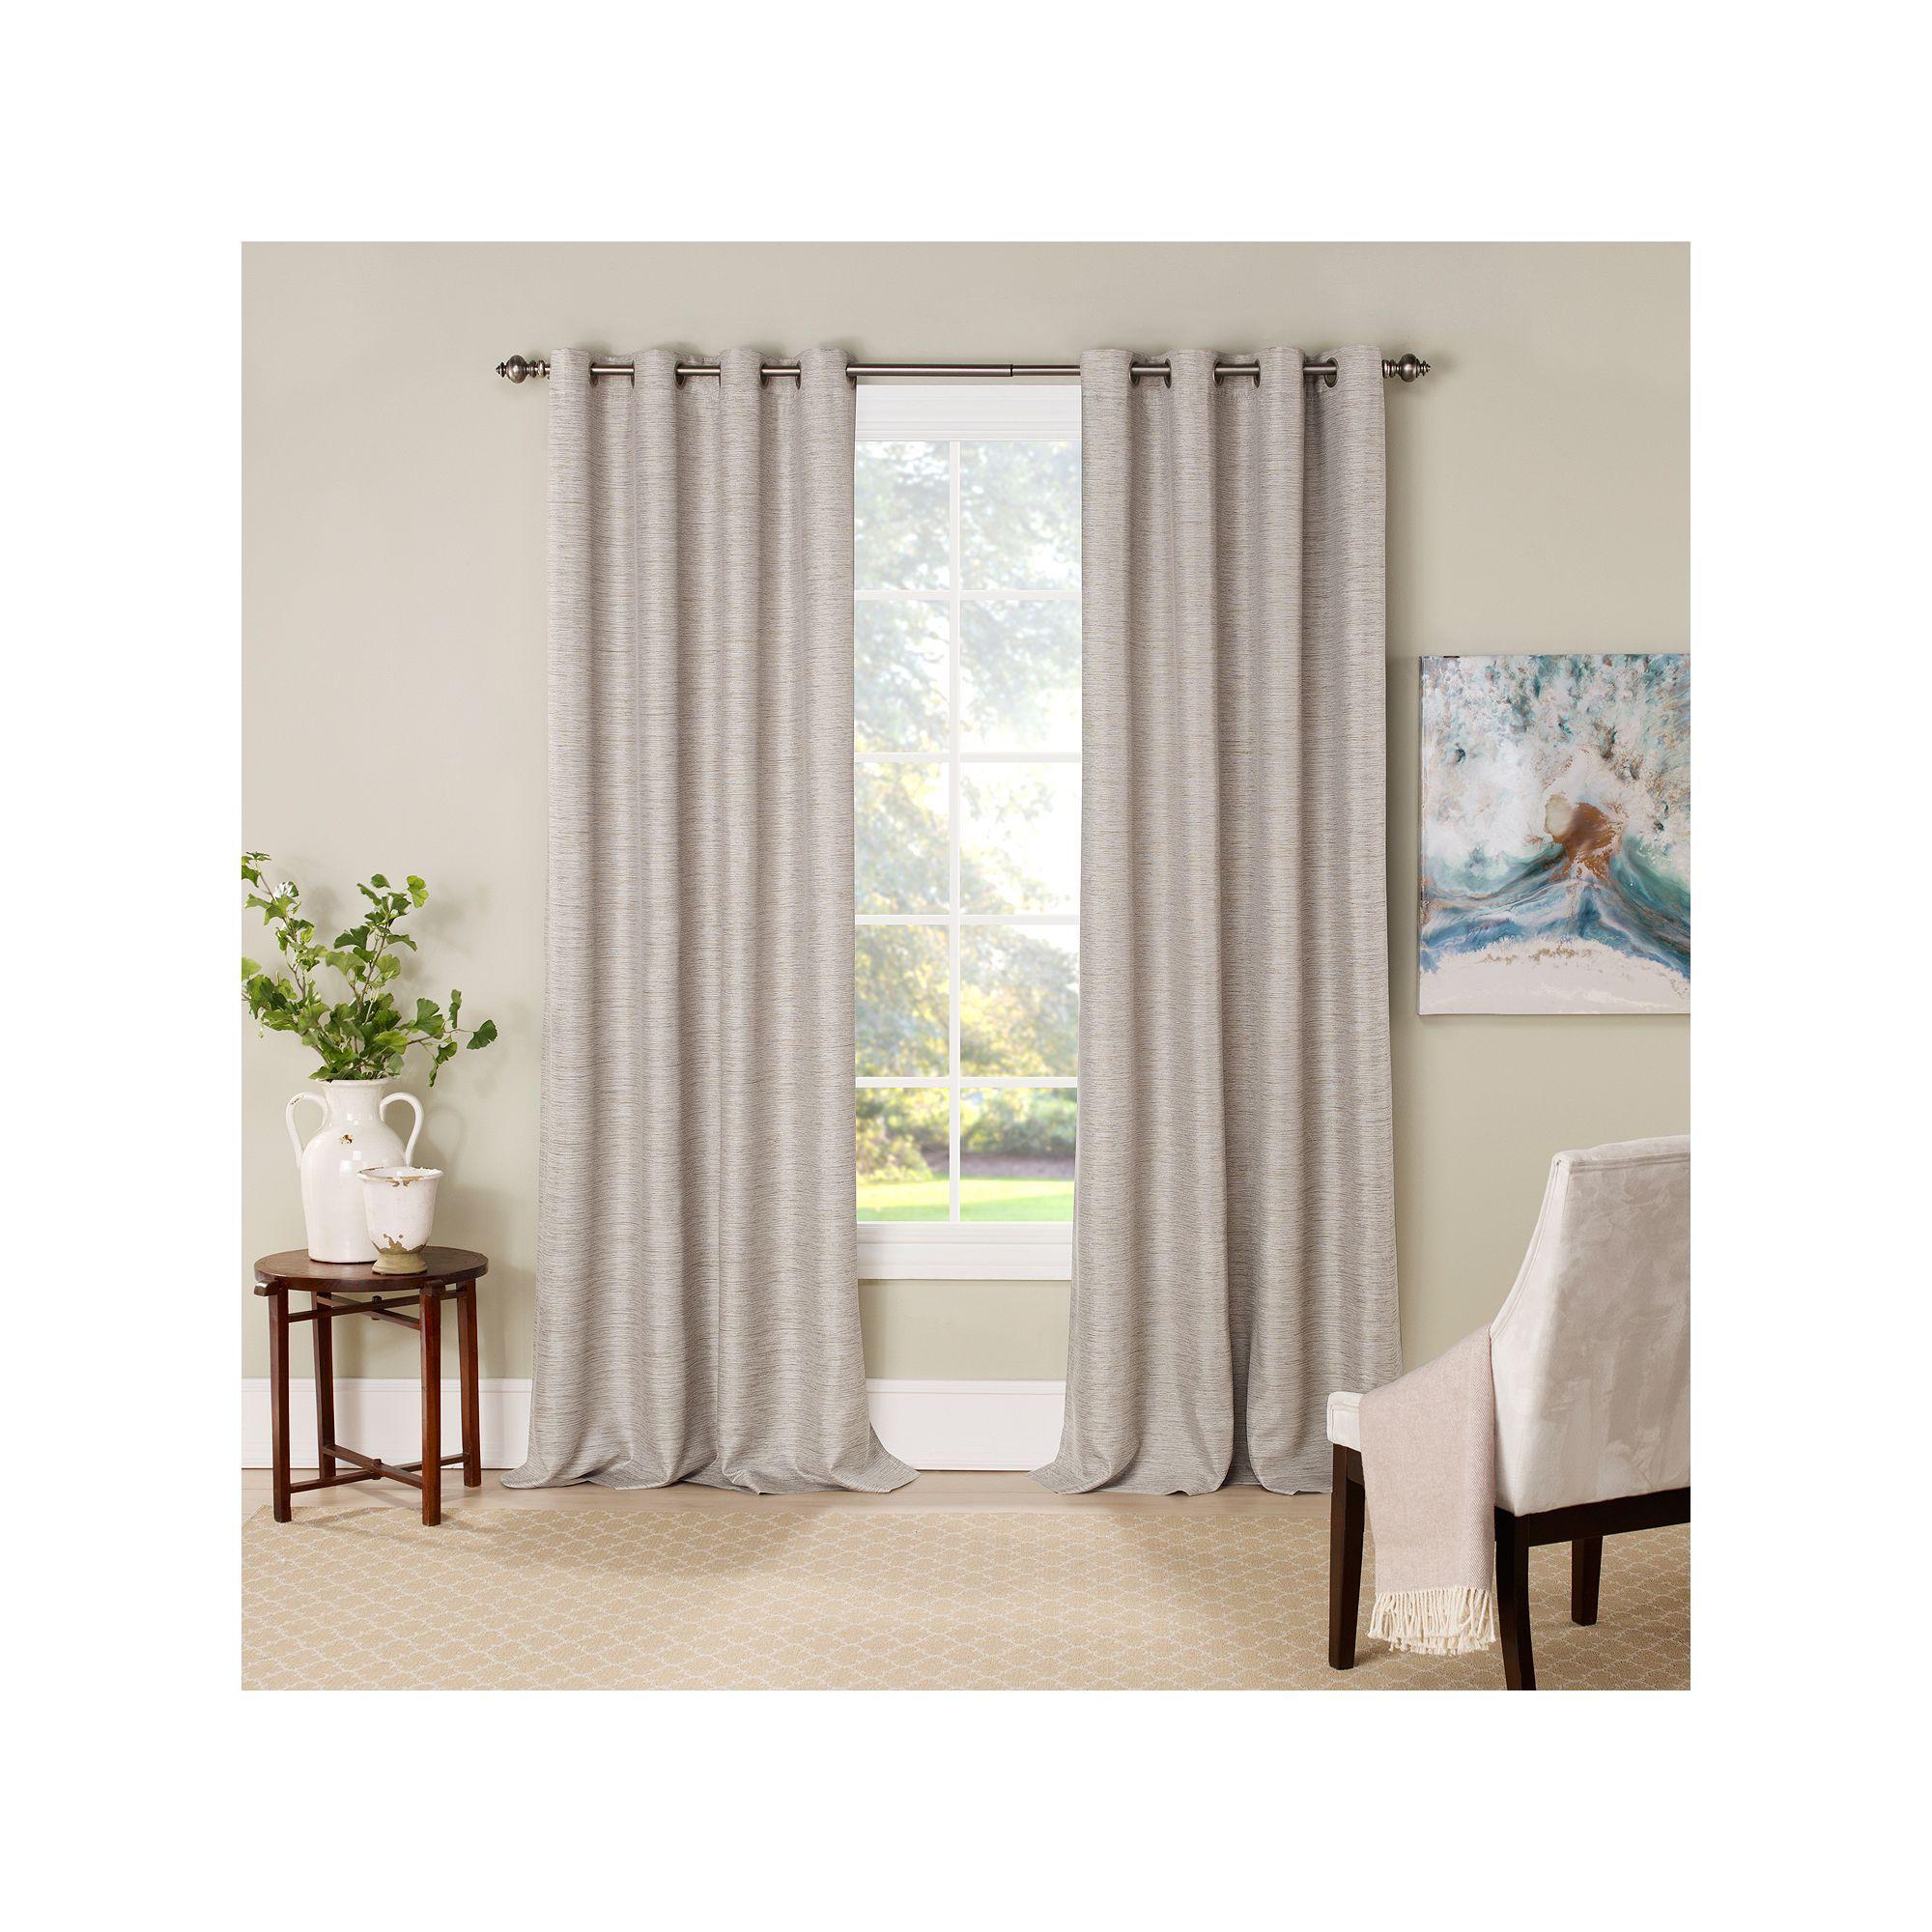 Eclipse Newport Thermalayer Room Darkening Curtain White Oth 16293052063IVY